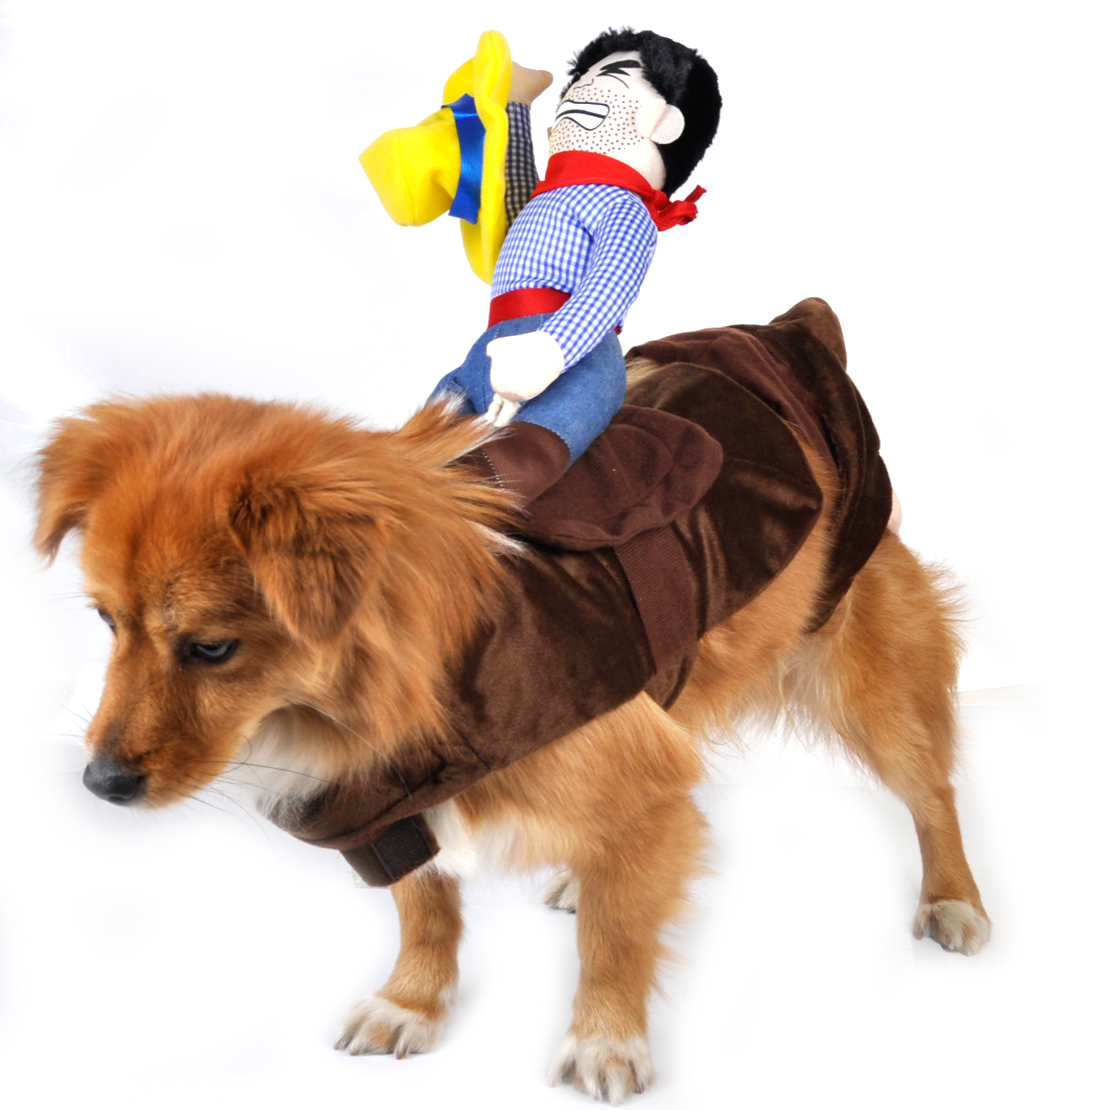 Pet Dog Rider Costume Cowboy Knight Puppy Cat Coat Rider